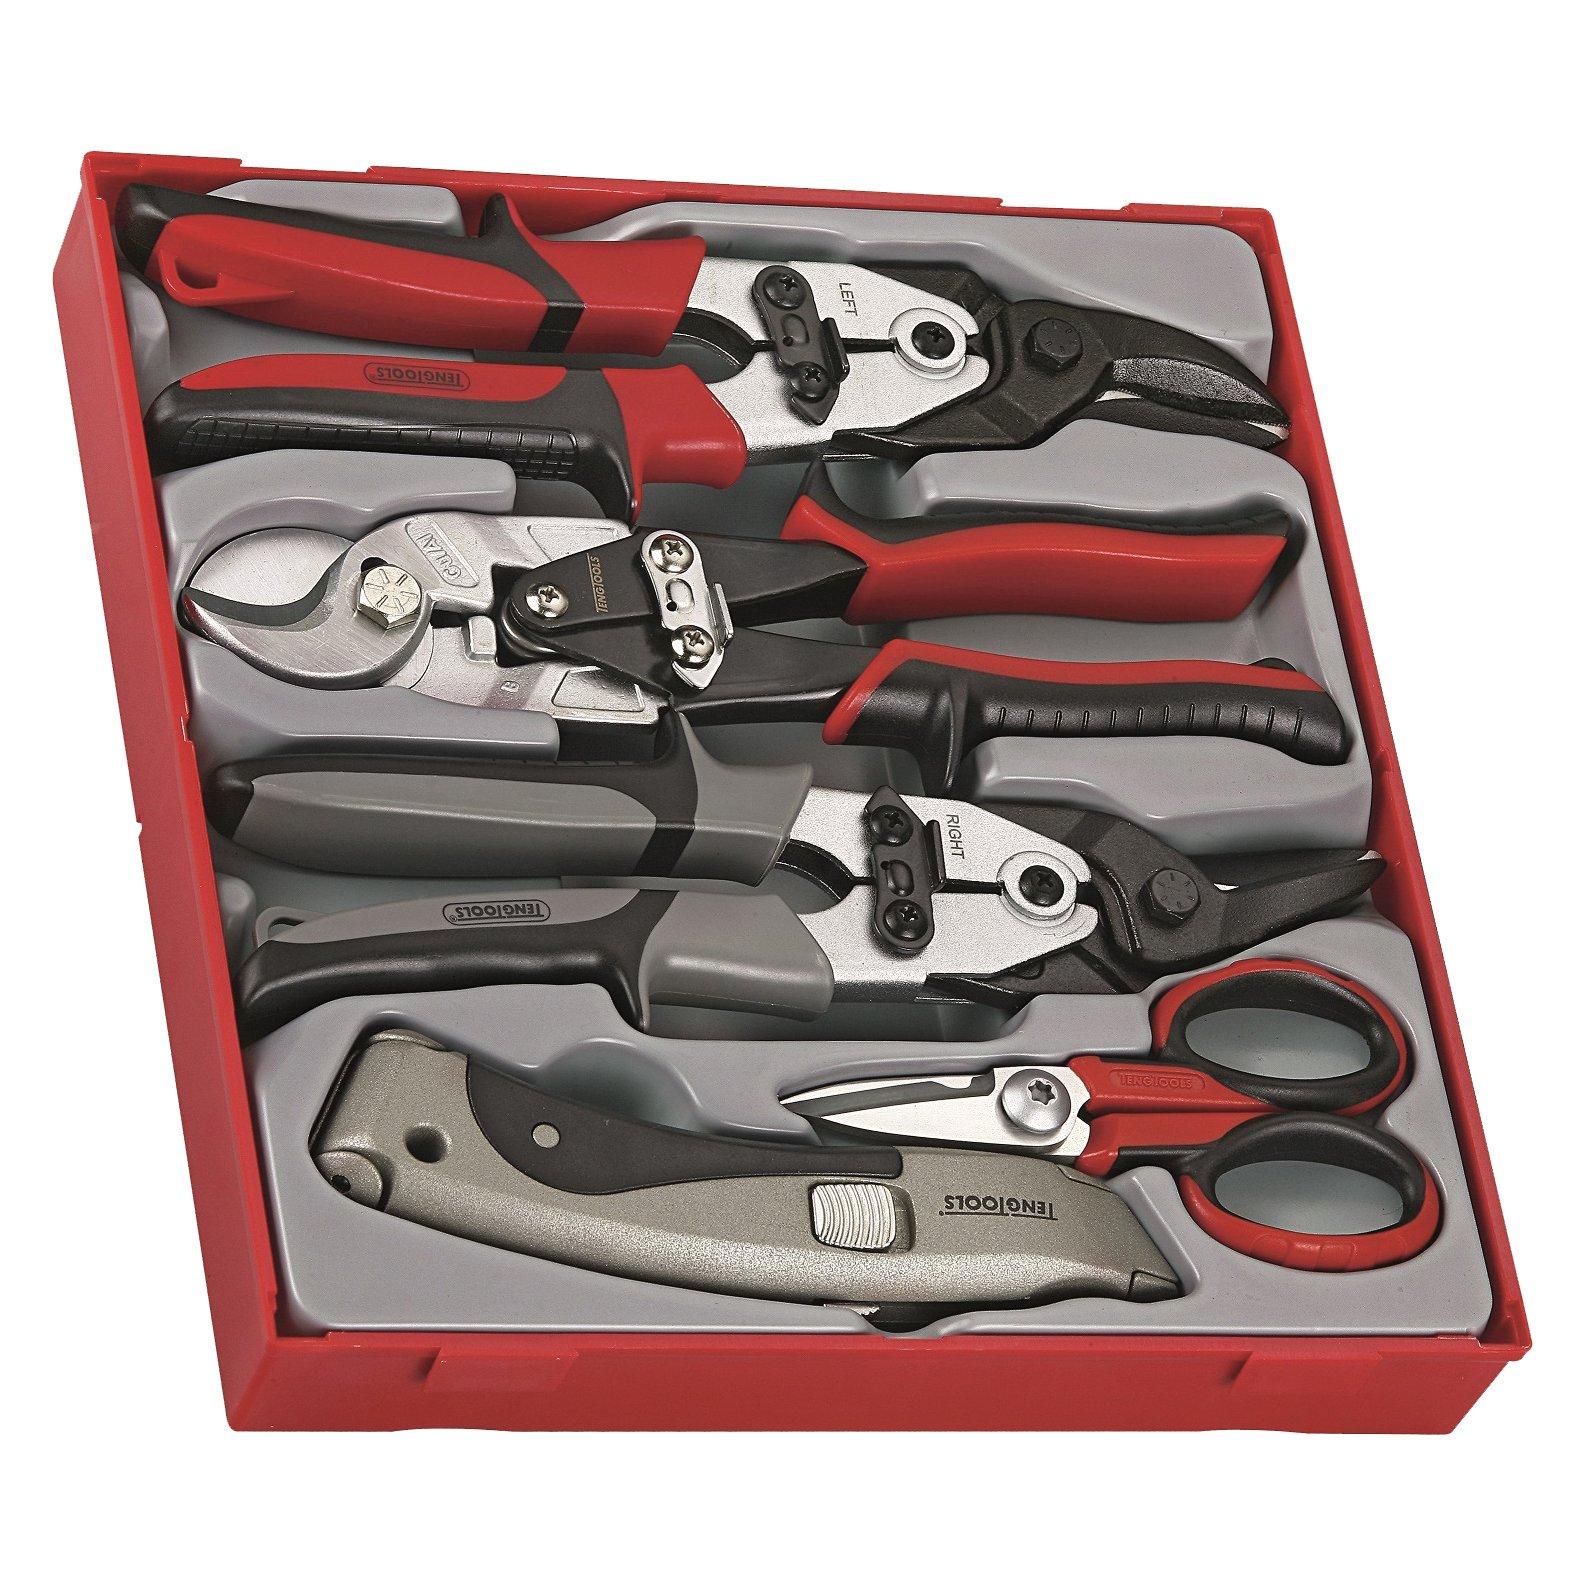 Teng Tools TTDCT05 5 Piece Cutting Tool Set by Teng Tools